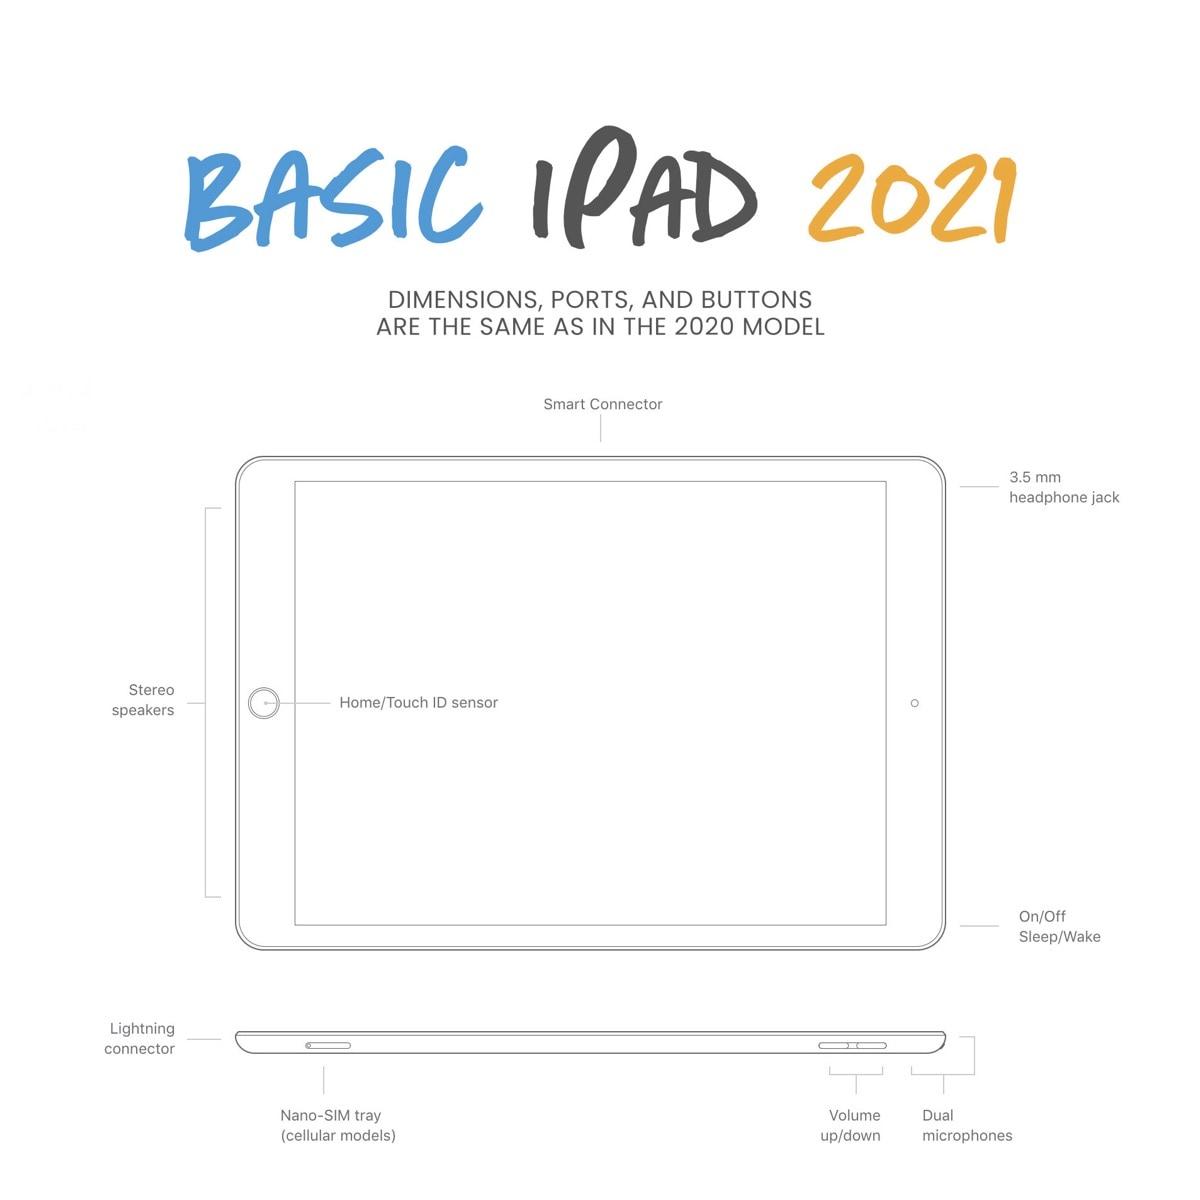 Basic Apple iPad 2021 ports buttons